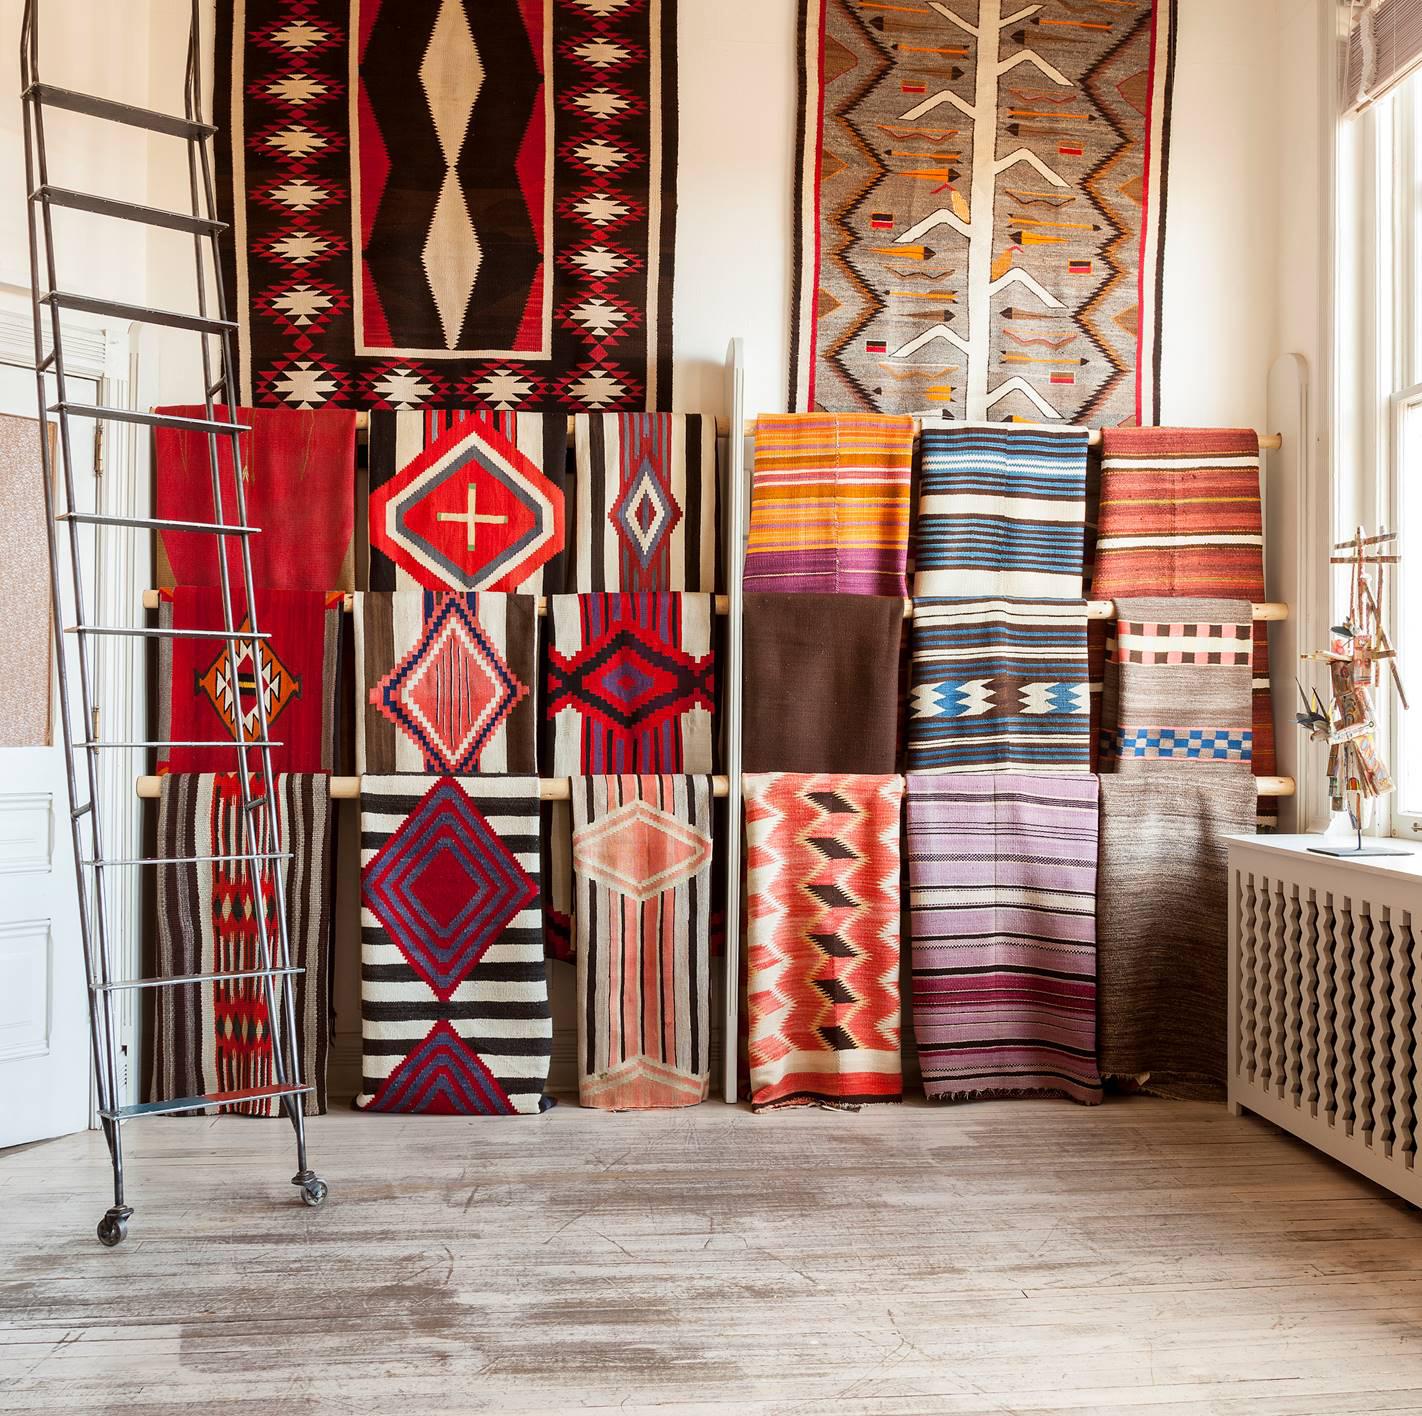 Native American Rugs In Santa Fe: Shiprock Santa Fe Gallery Presents Trunk Show Of Rare